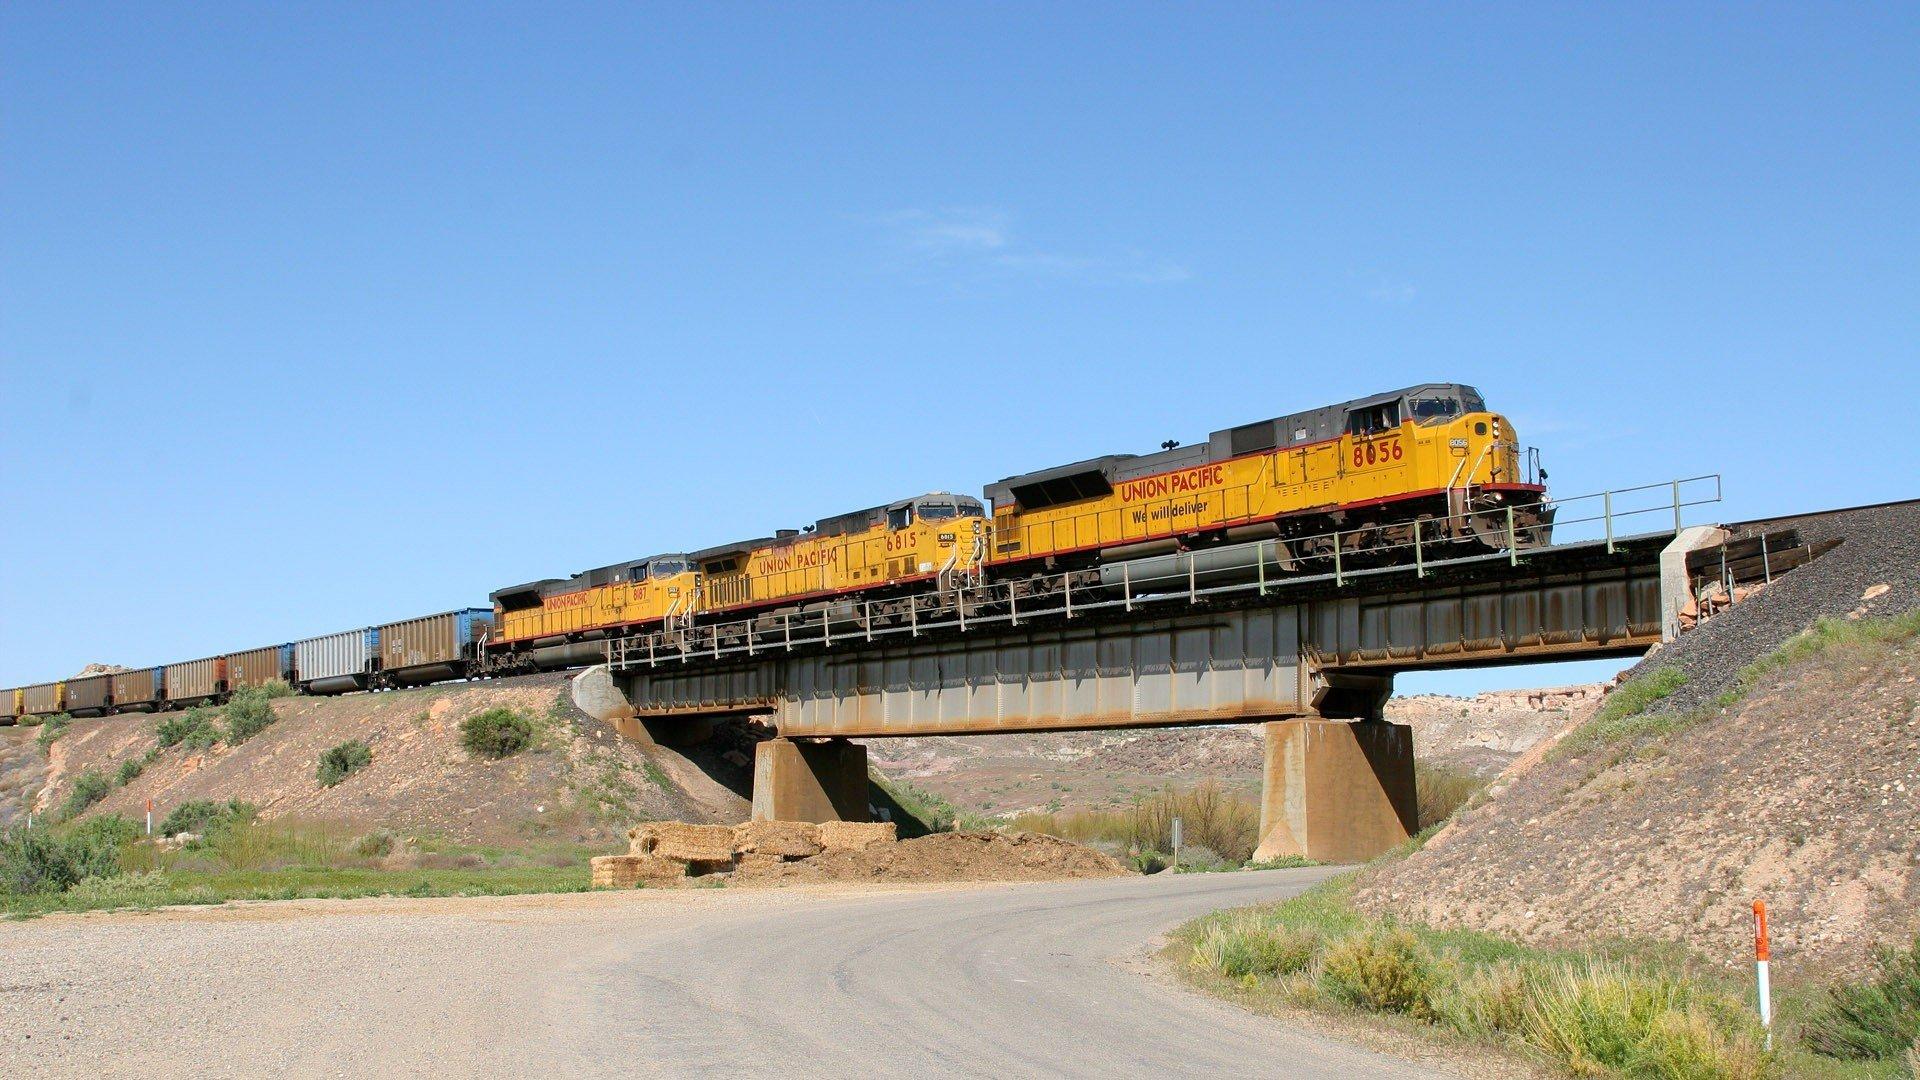 Trainwallpaper 1920x1080